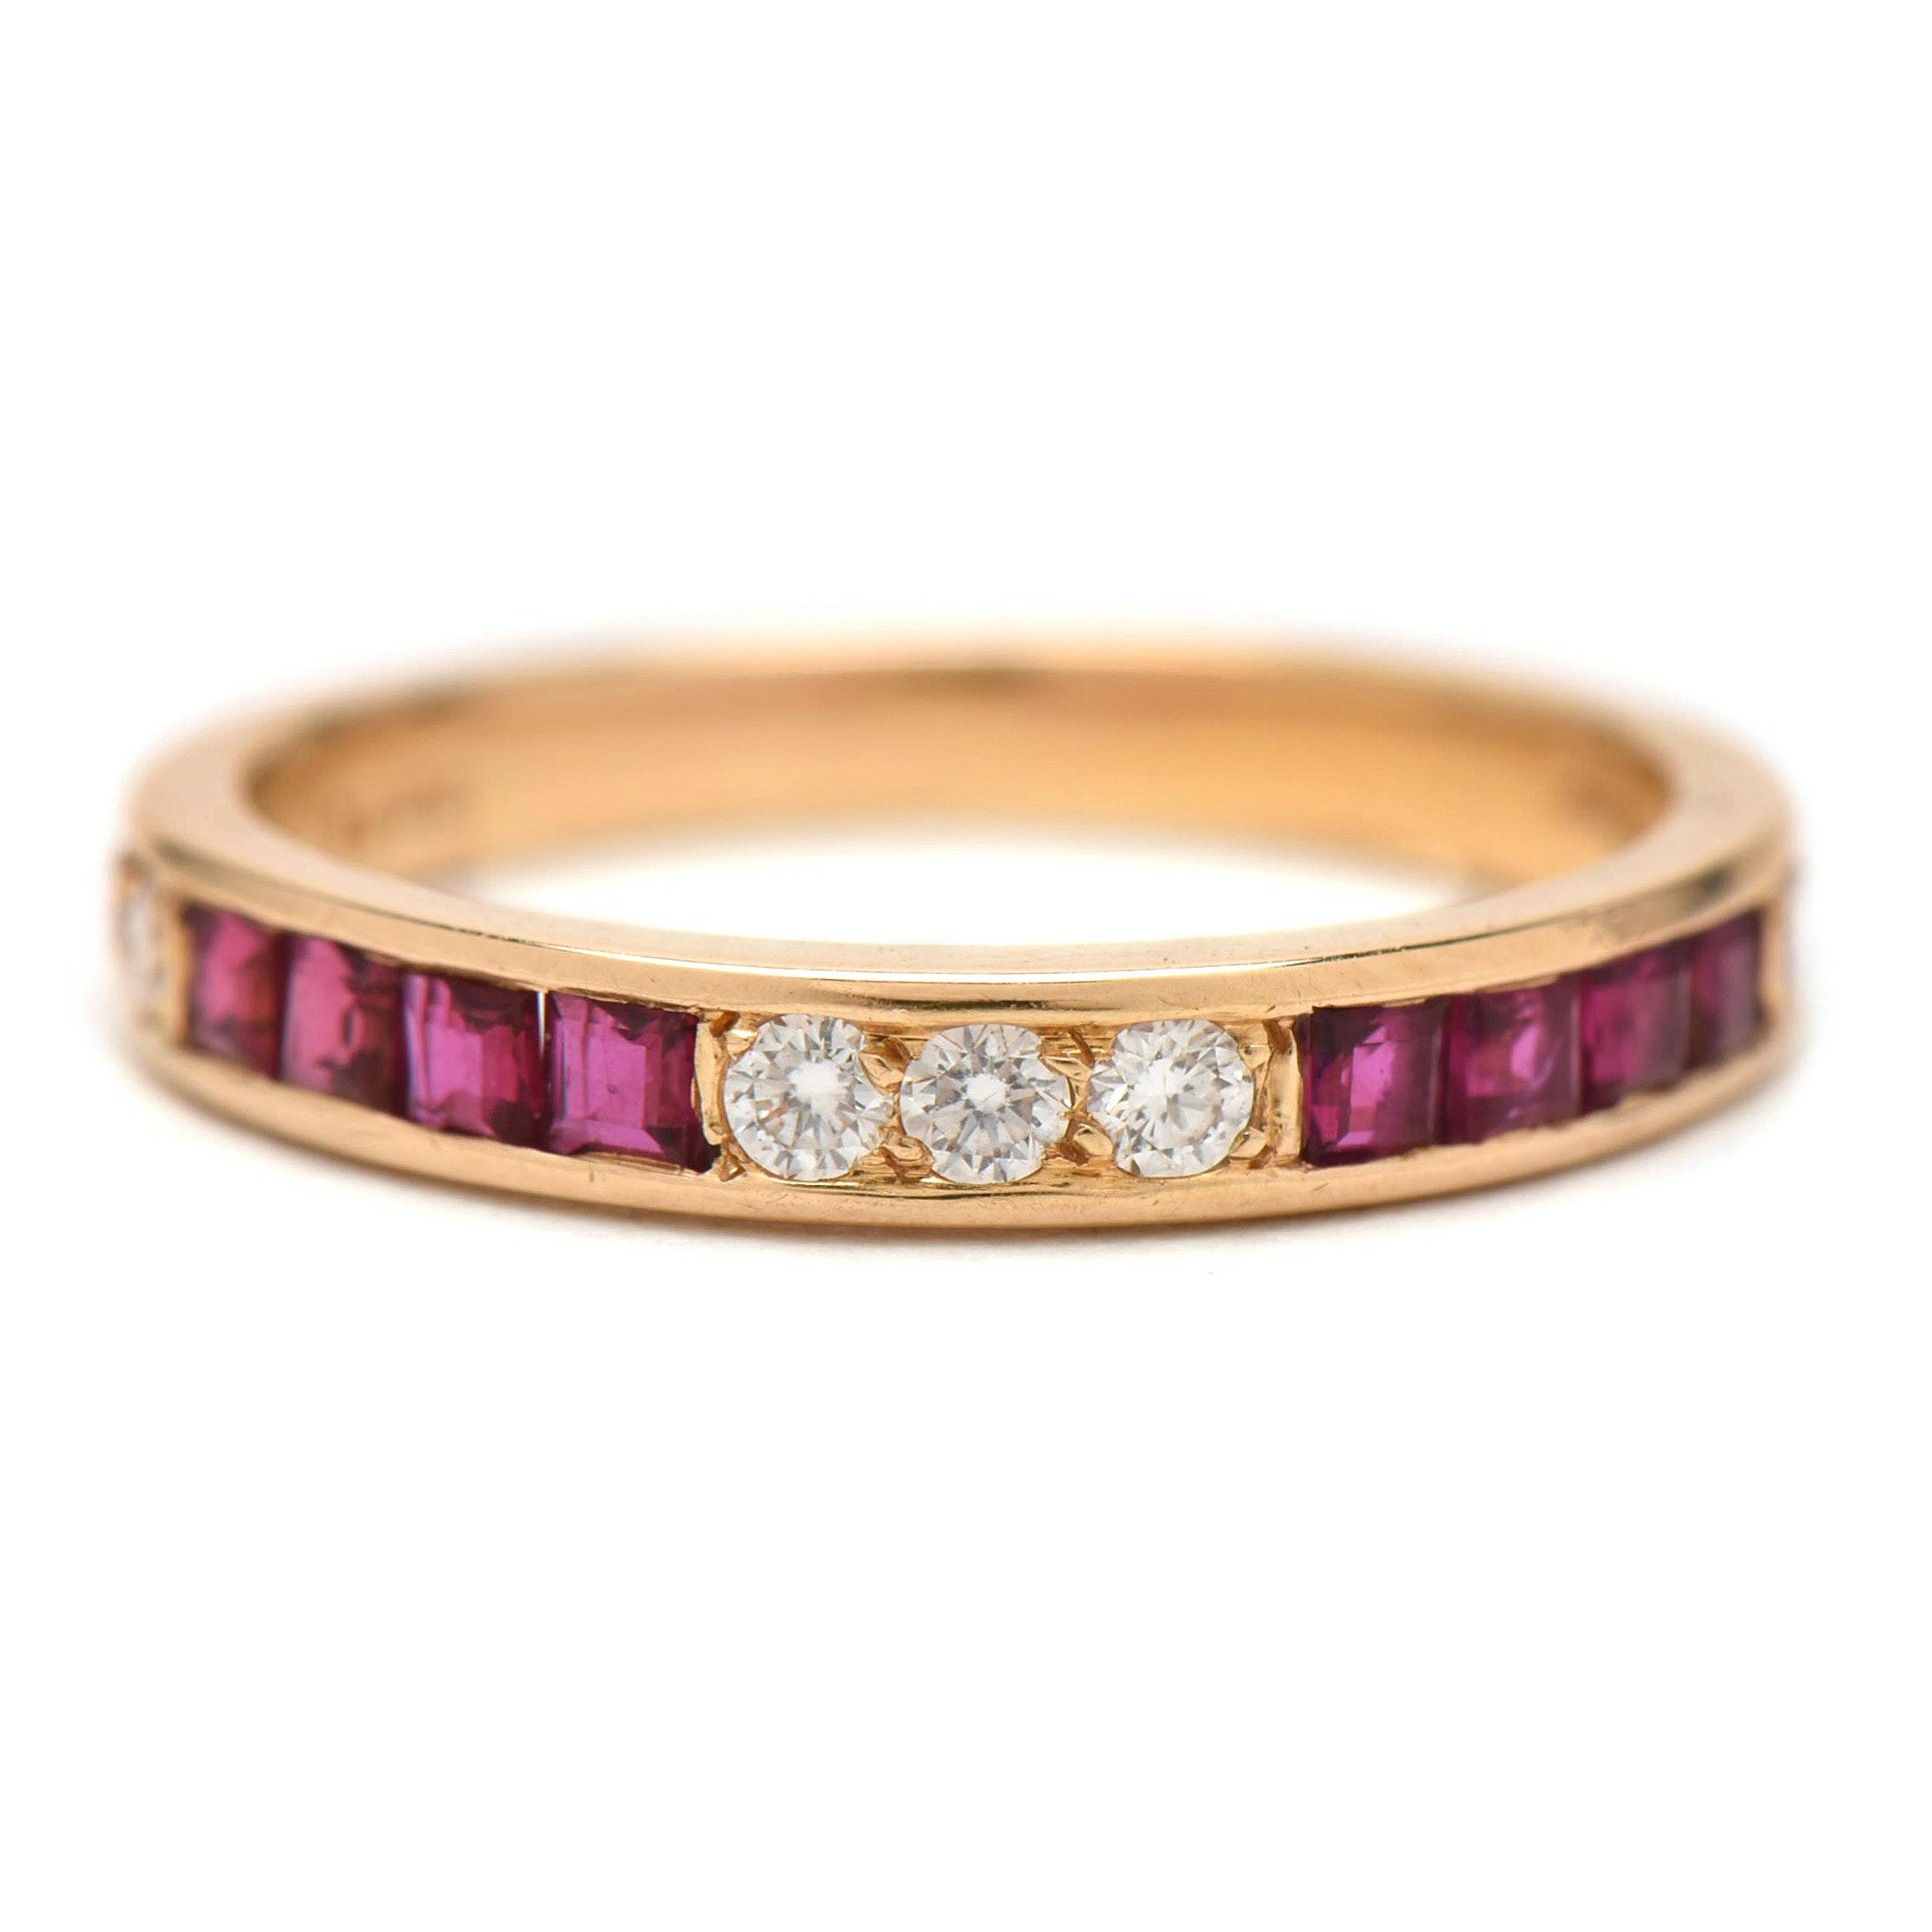 Oscar Heyman Brothers 18K Yellow Gold Diamond and Ruby Band Ring